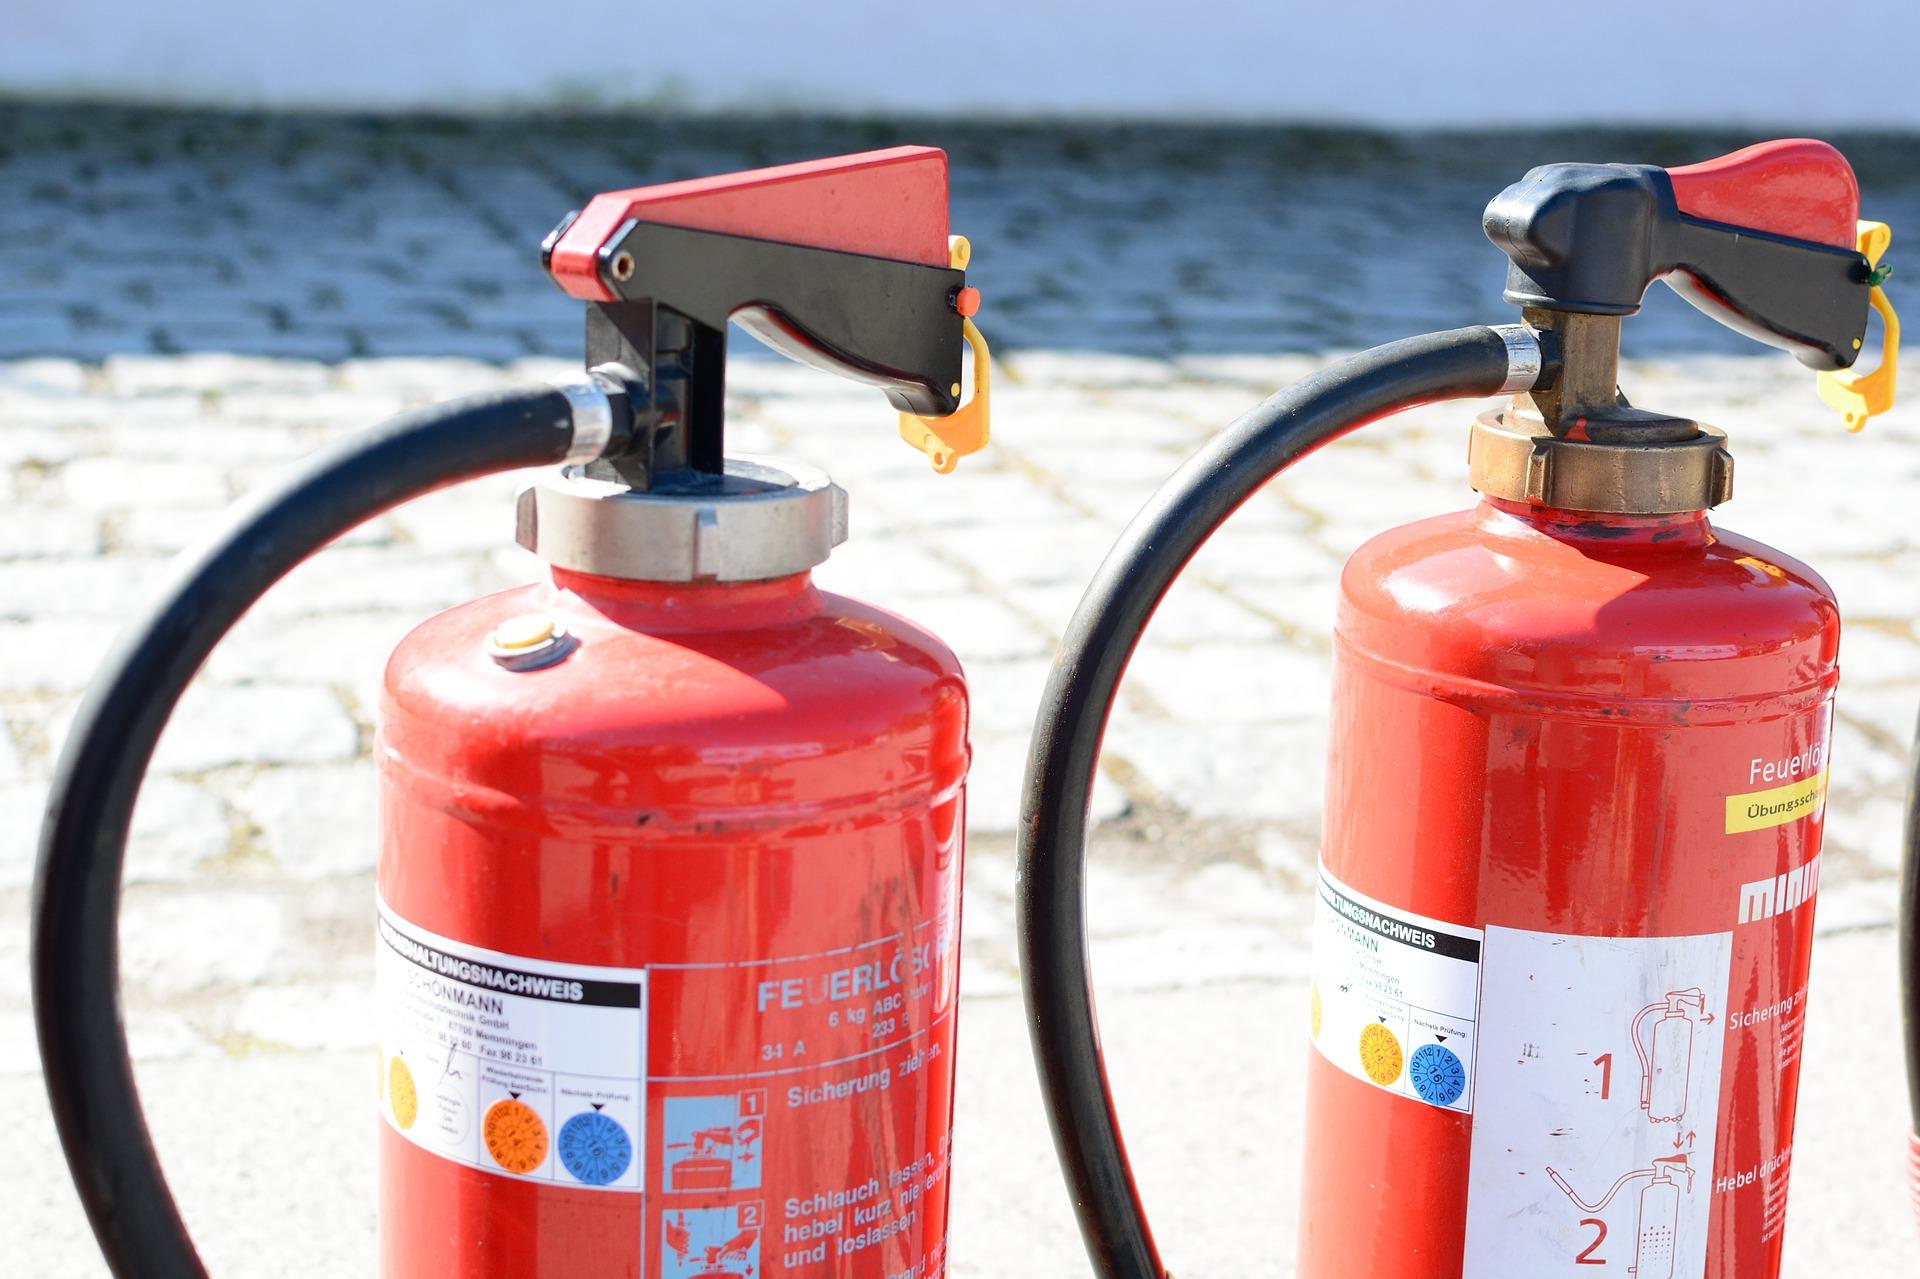 fire-extinguisher-712978_1920